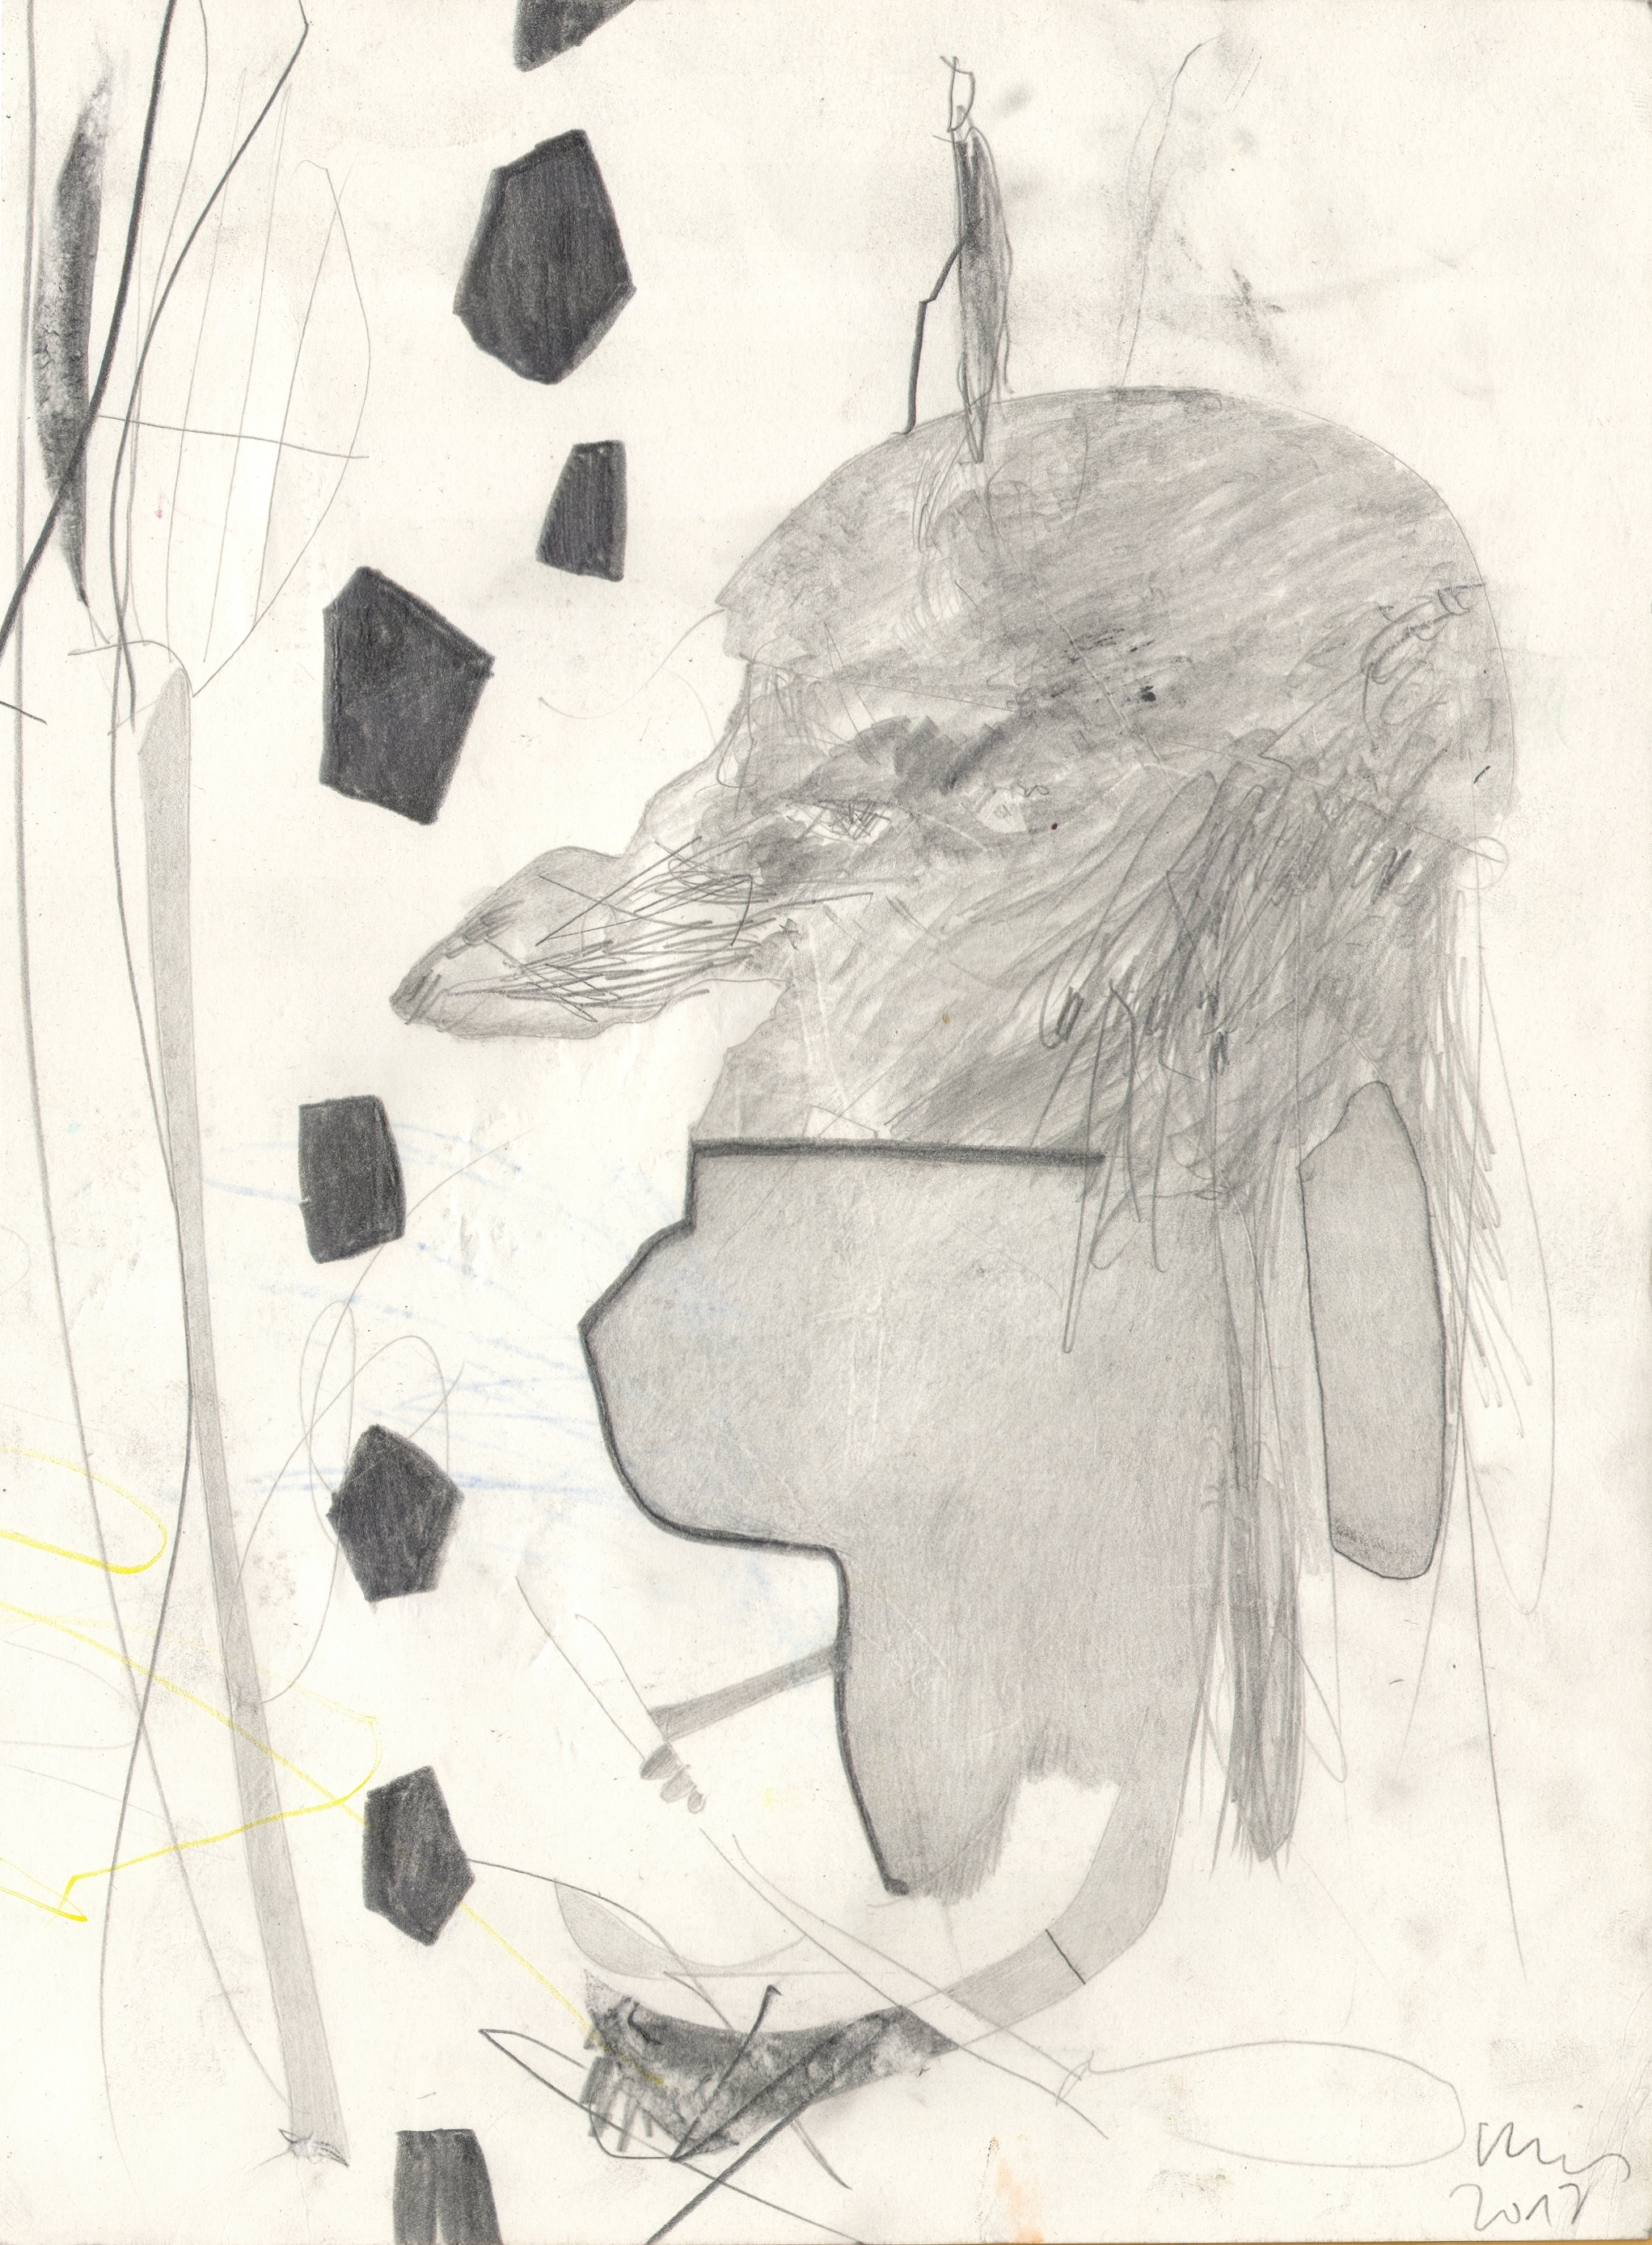 O.T. ( Person ), 2017  Bleistift auf Papier, 26x35.5cm